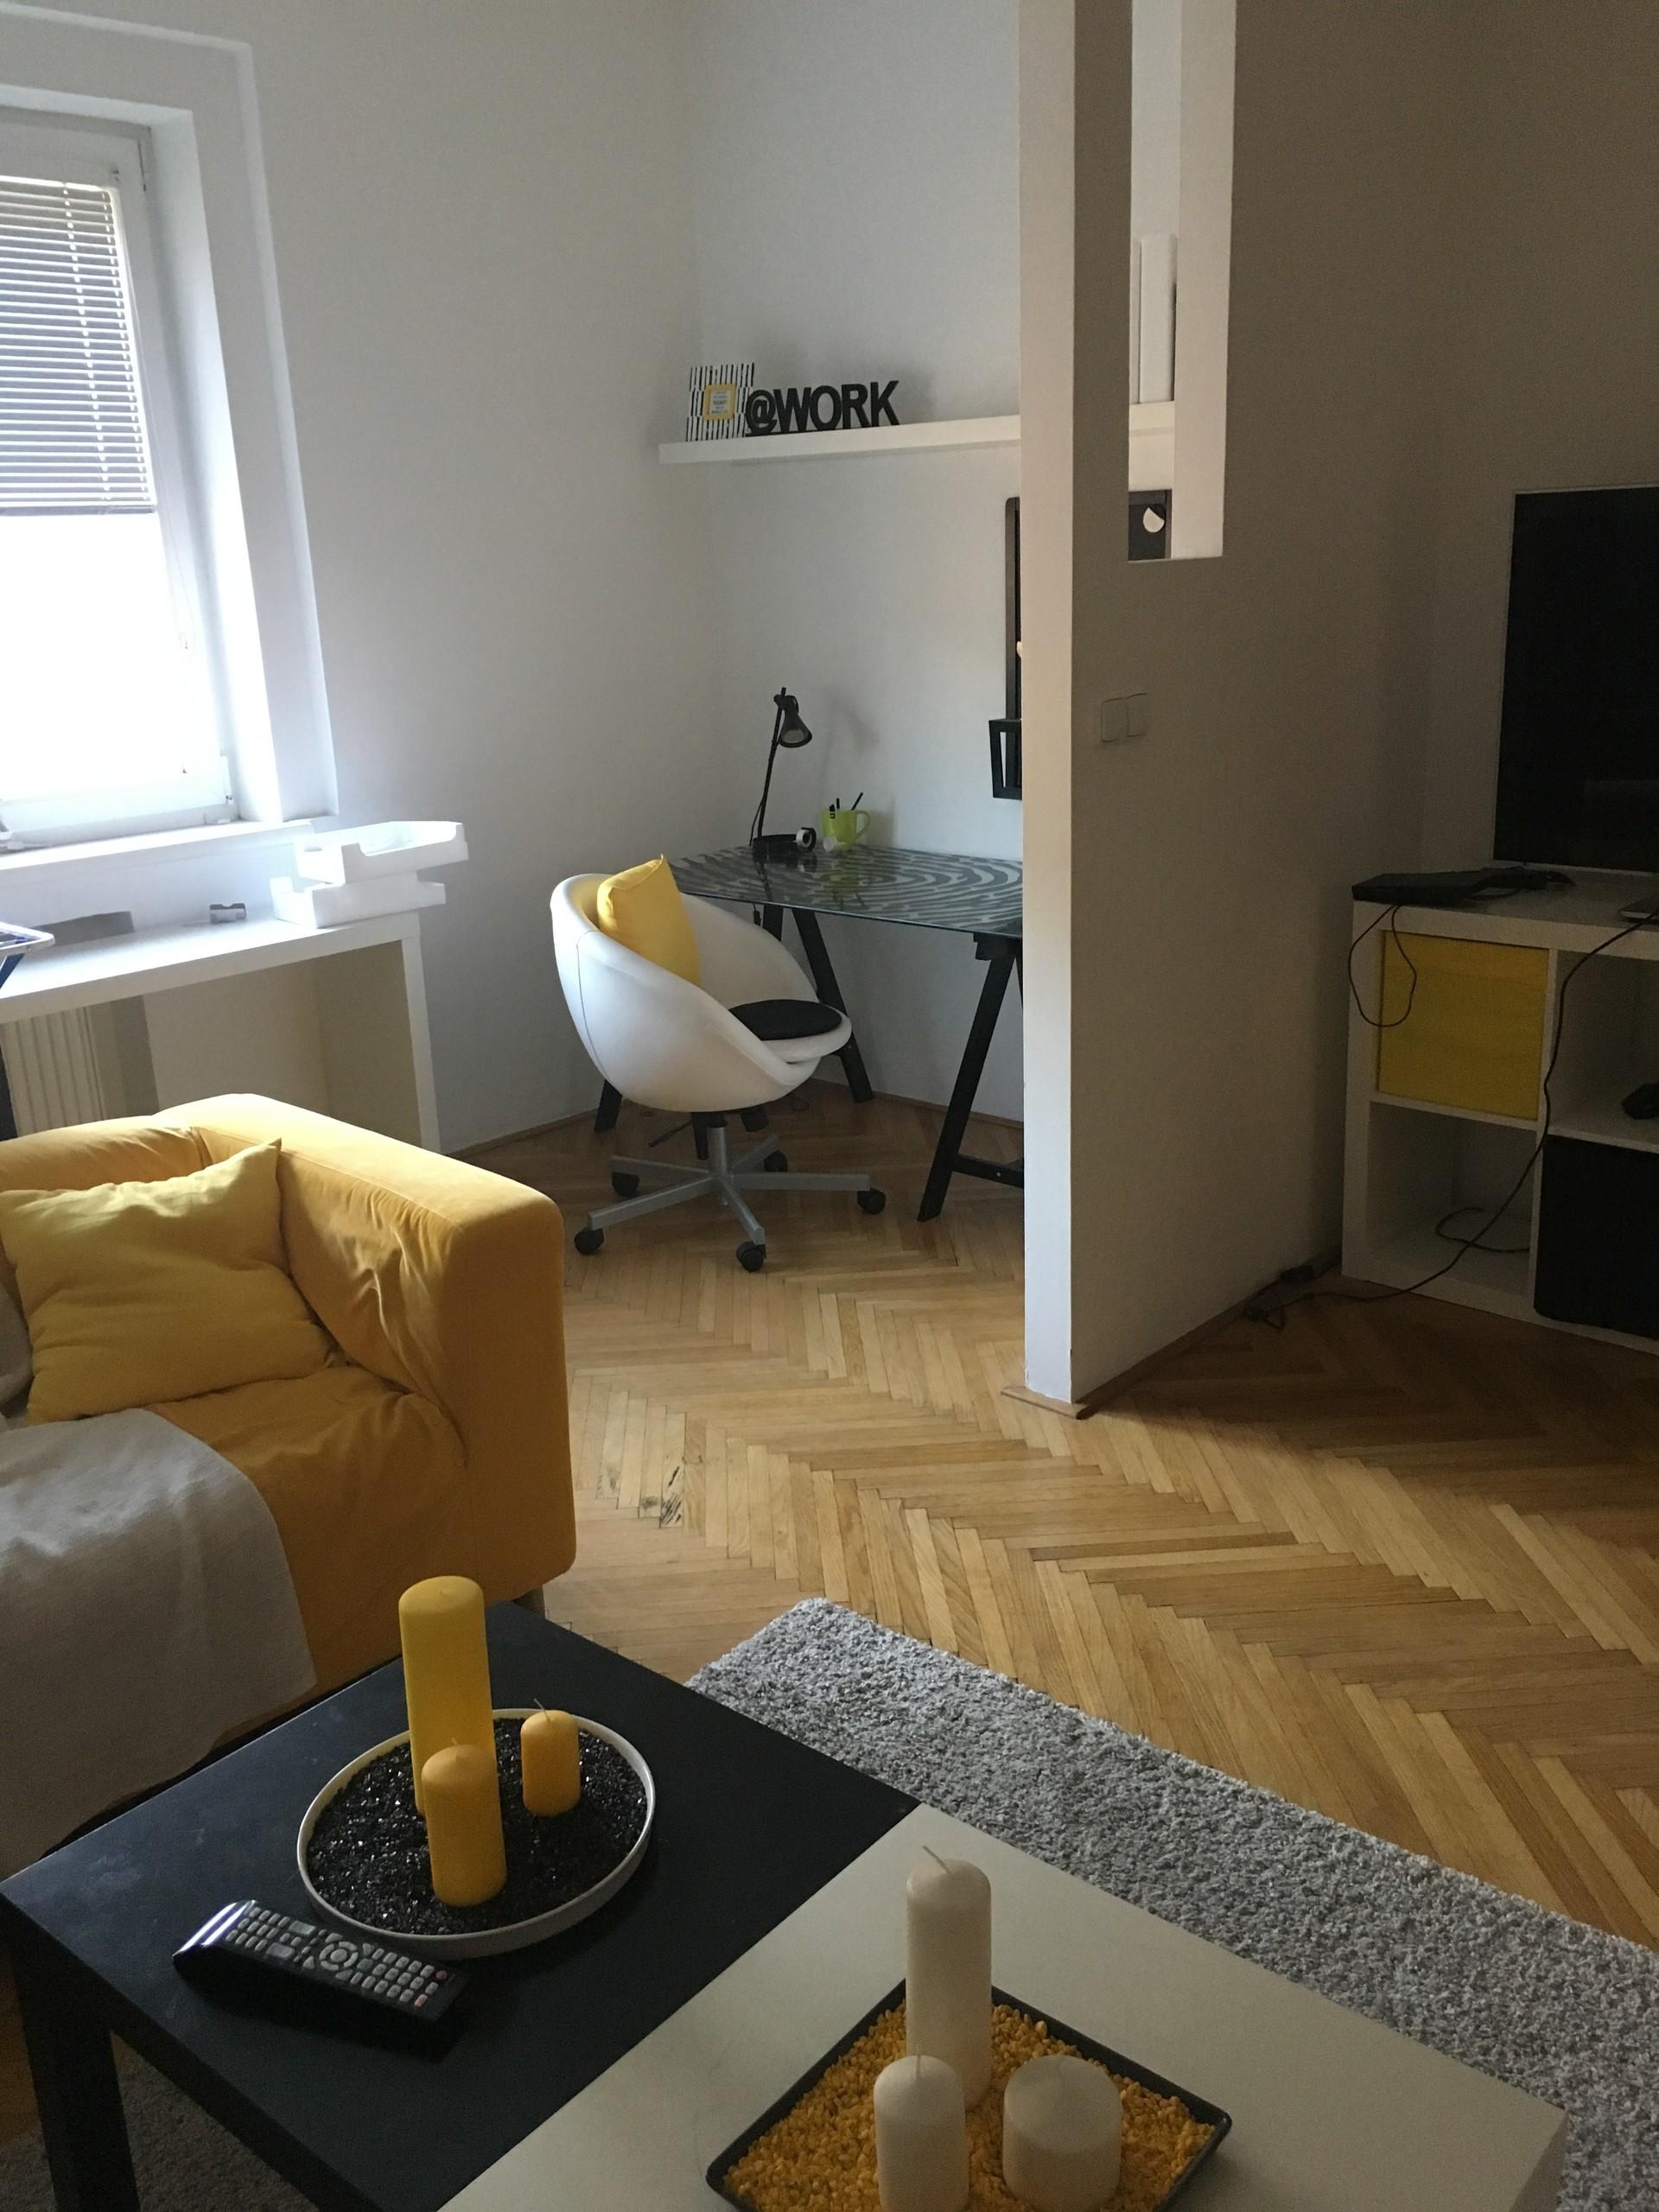 big-room-shared-flat-near-city-center-bratislava-d3afb7732a3cdeaef7cc432250b3424c